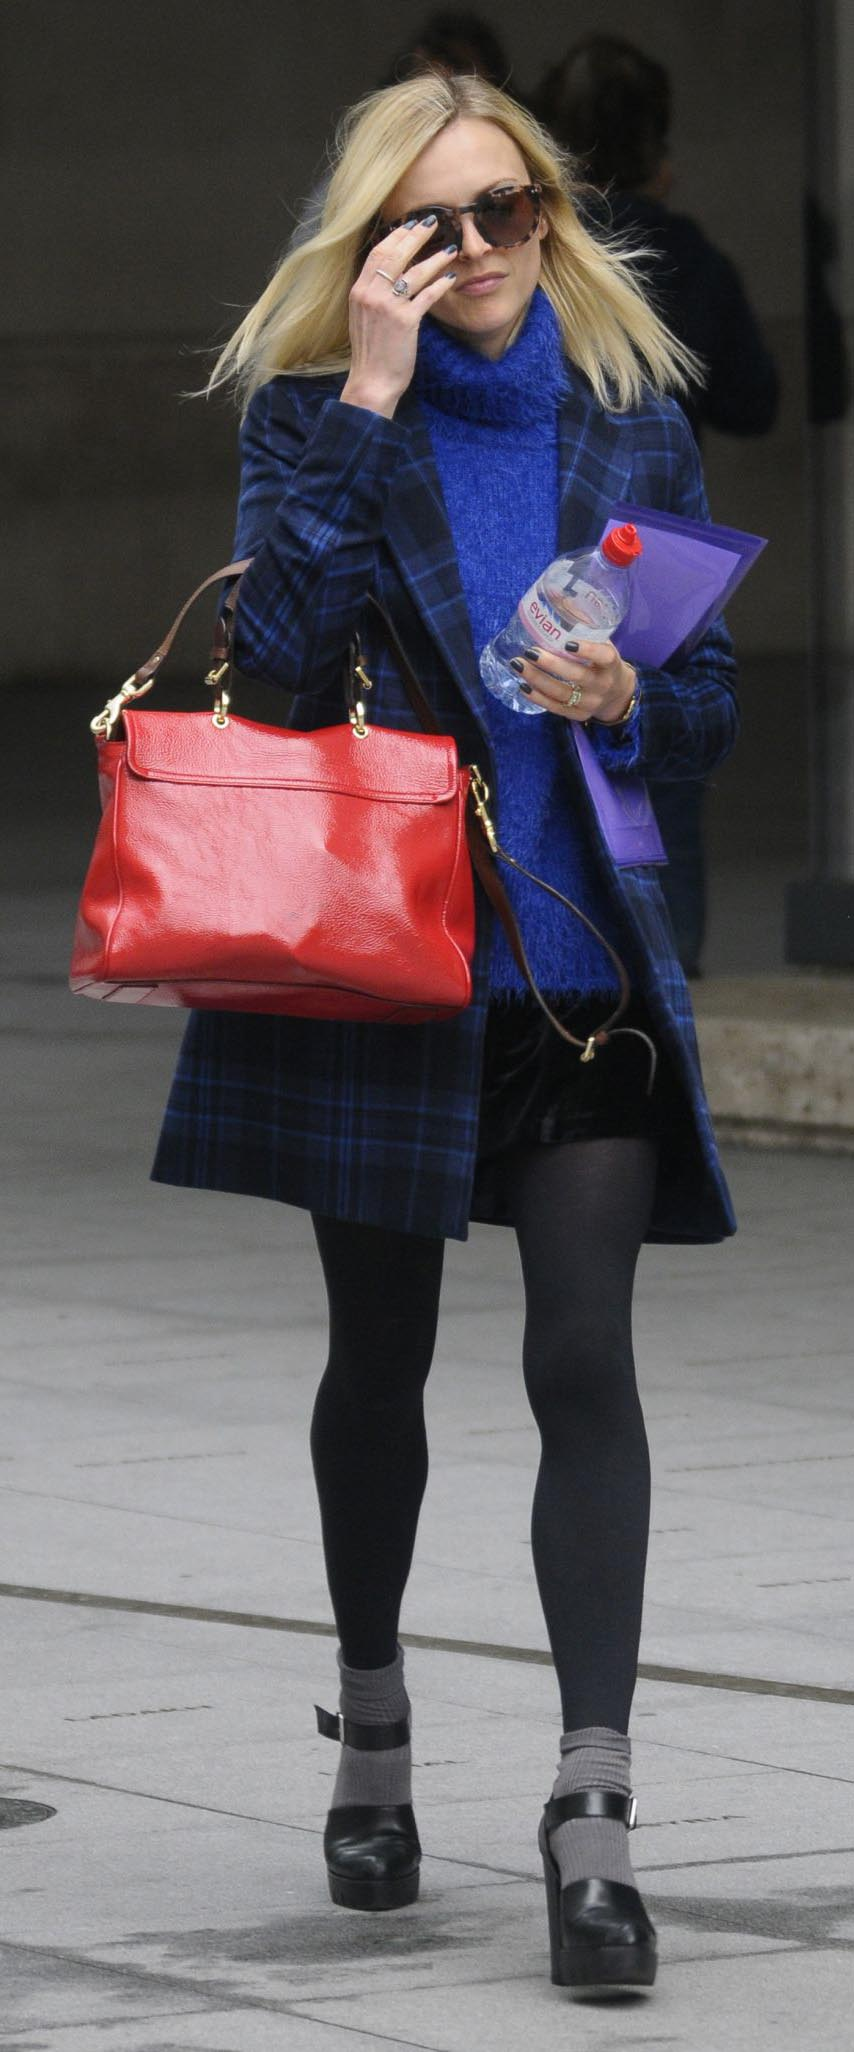 black-mini-skirt-blue-navy-sweater-blue-navy-jacket-coat-plaid-red-bag-sun-black-tights-fearnecotton-fall-winter-blue-cobalt-turtleneck-socks-black-shoe-sandalh-blonde-lunch.jpg